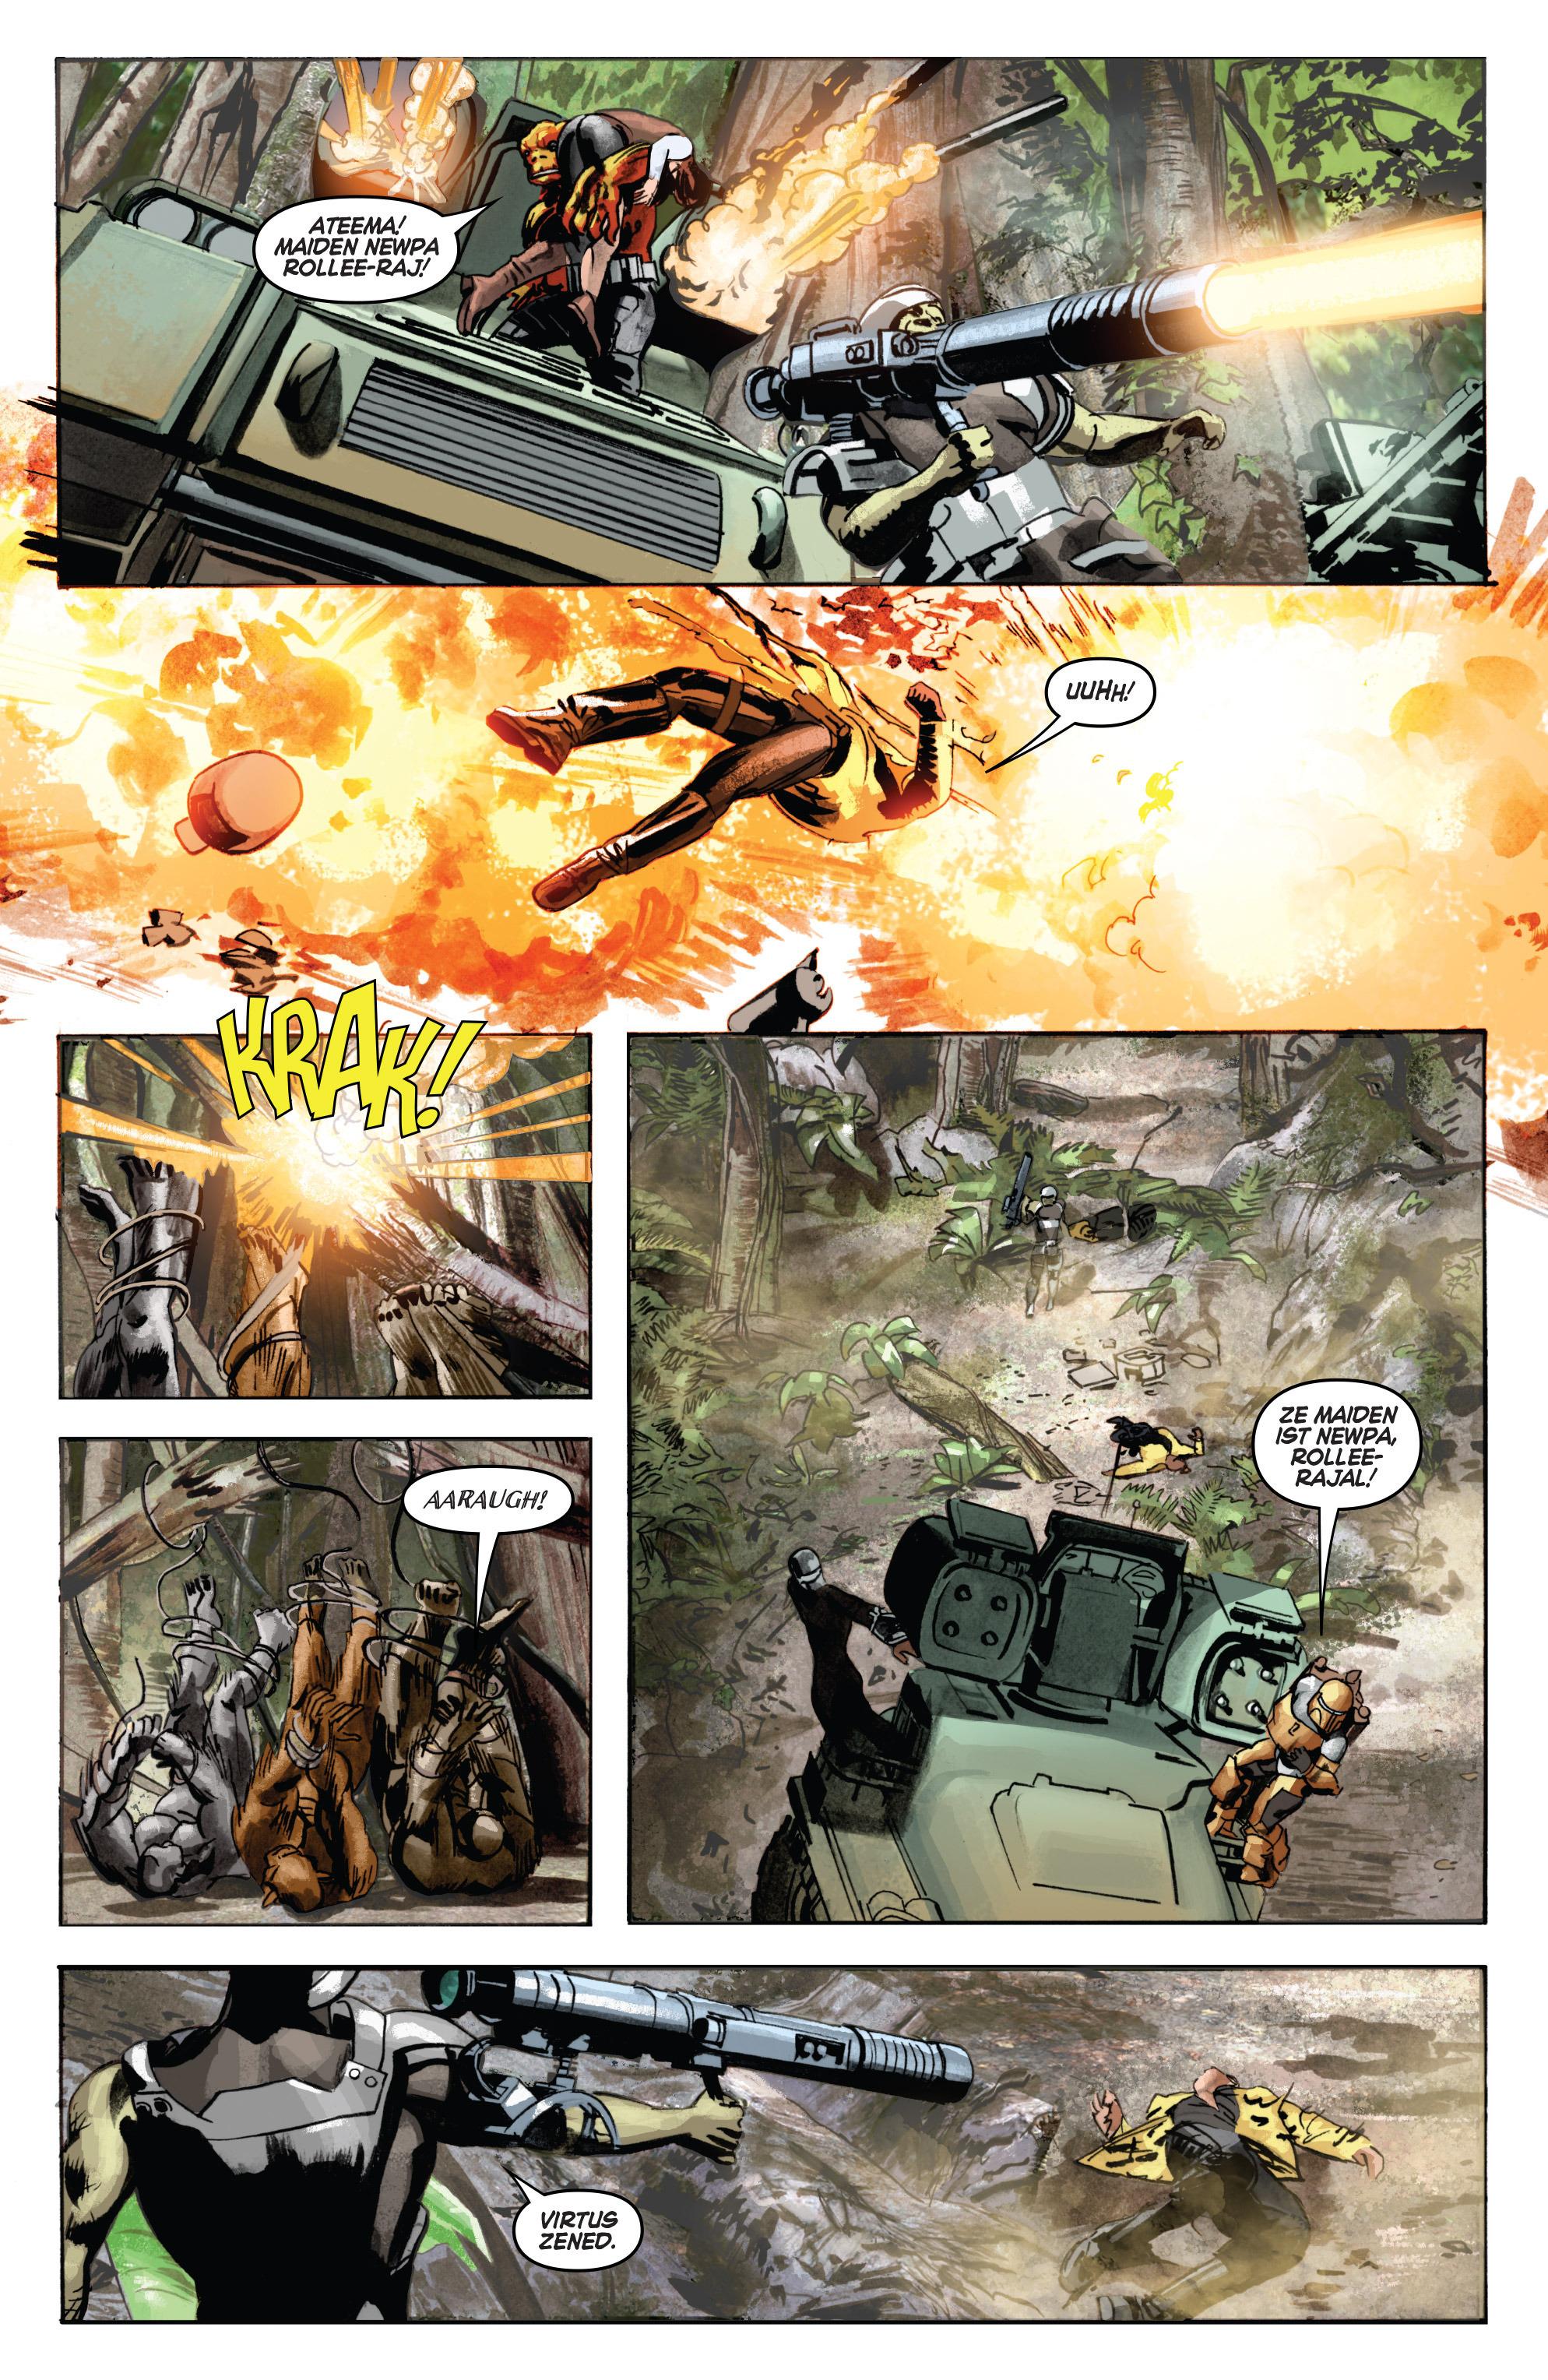 THE STAR WARS comic (2015, Marvel edition) Vol.7 18